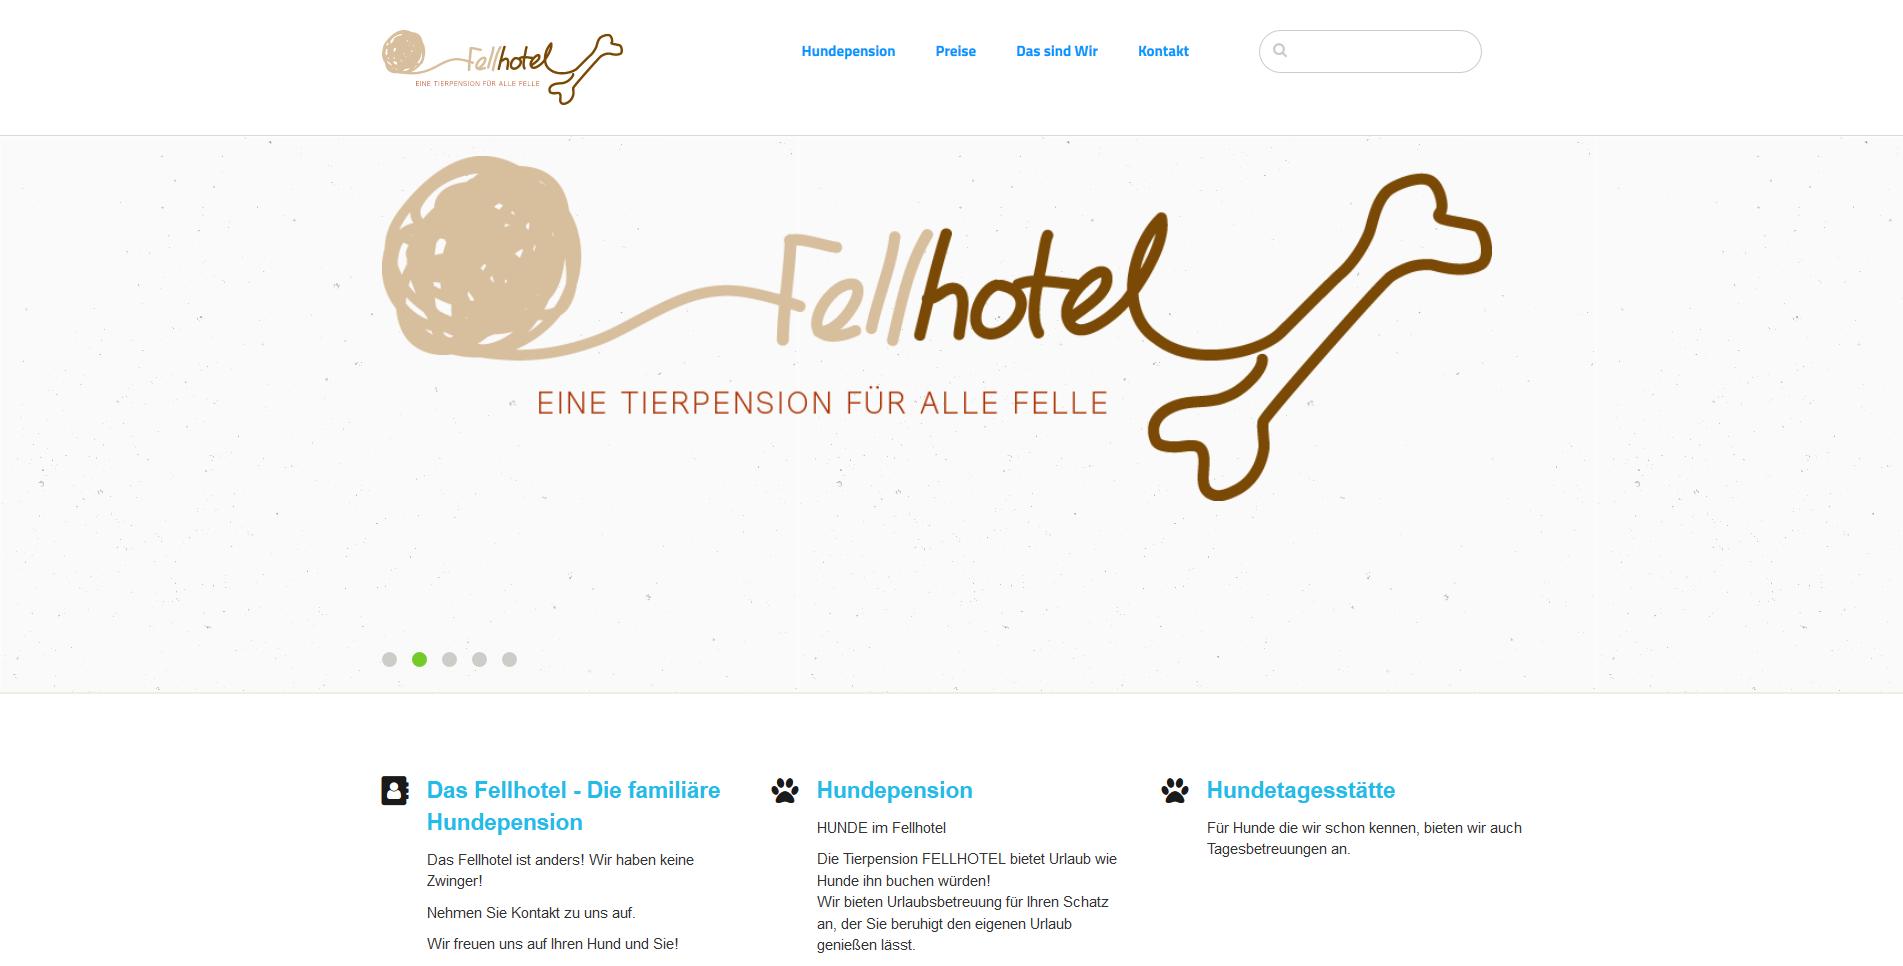 Tierpension Fellhotel